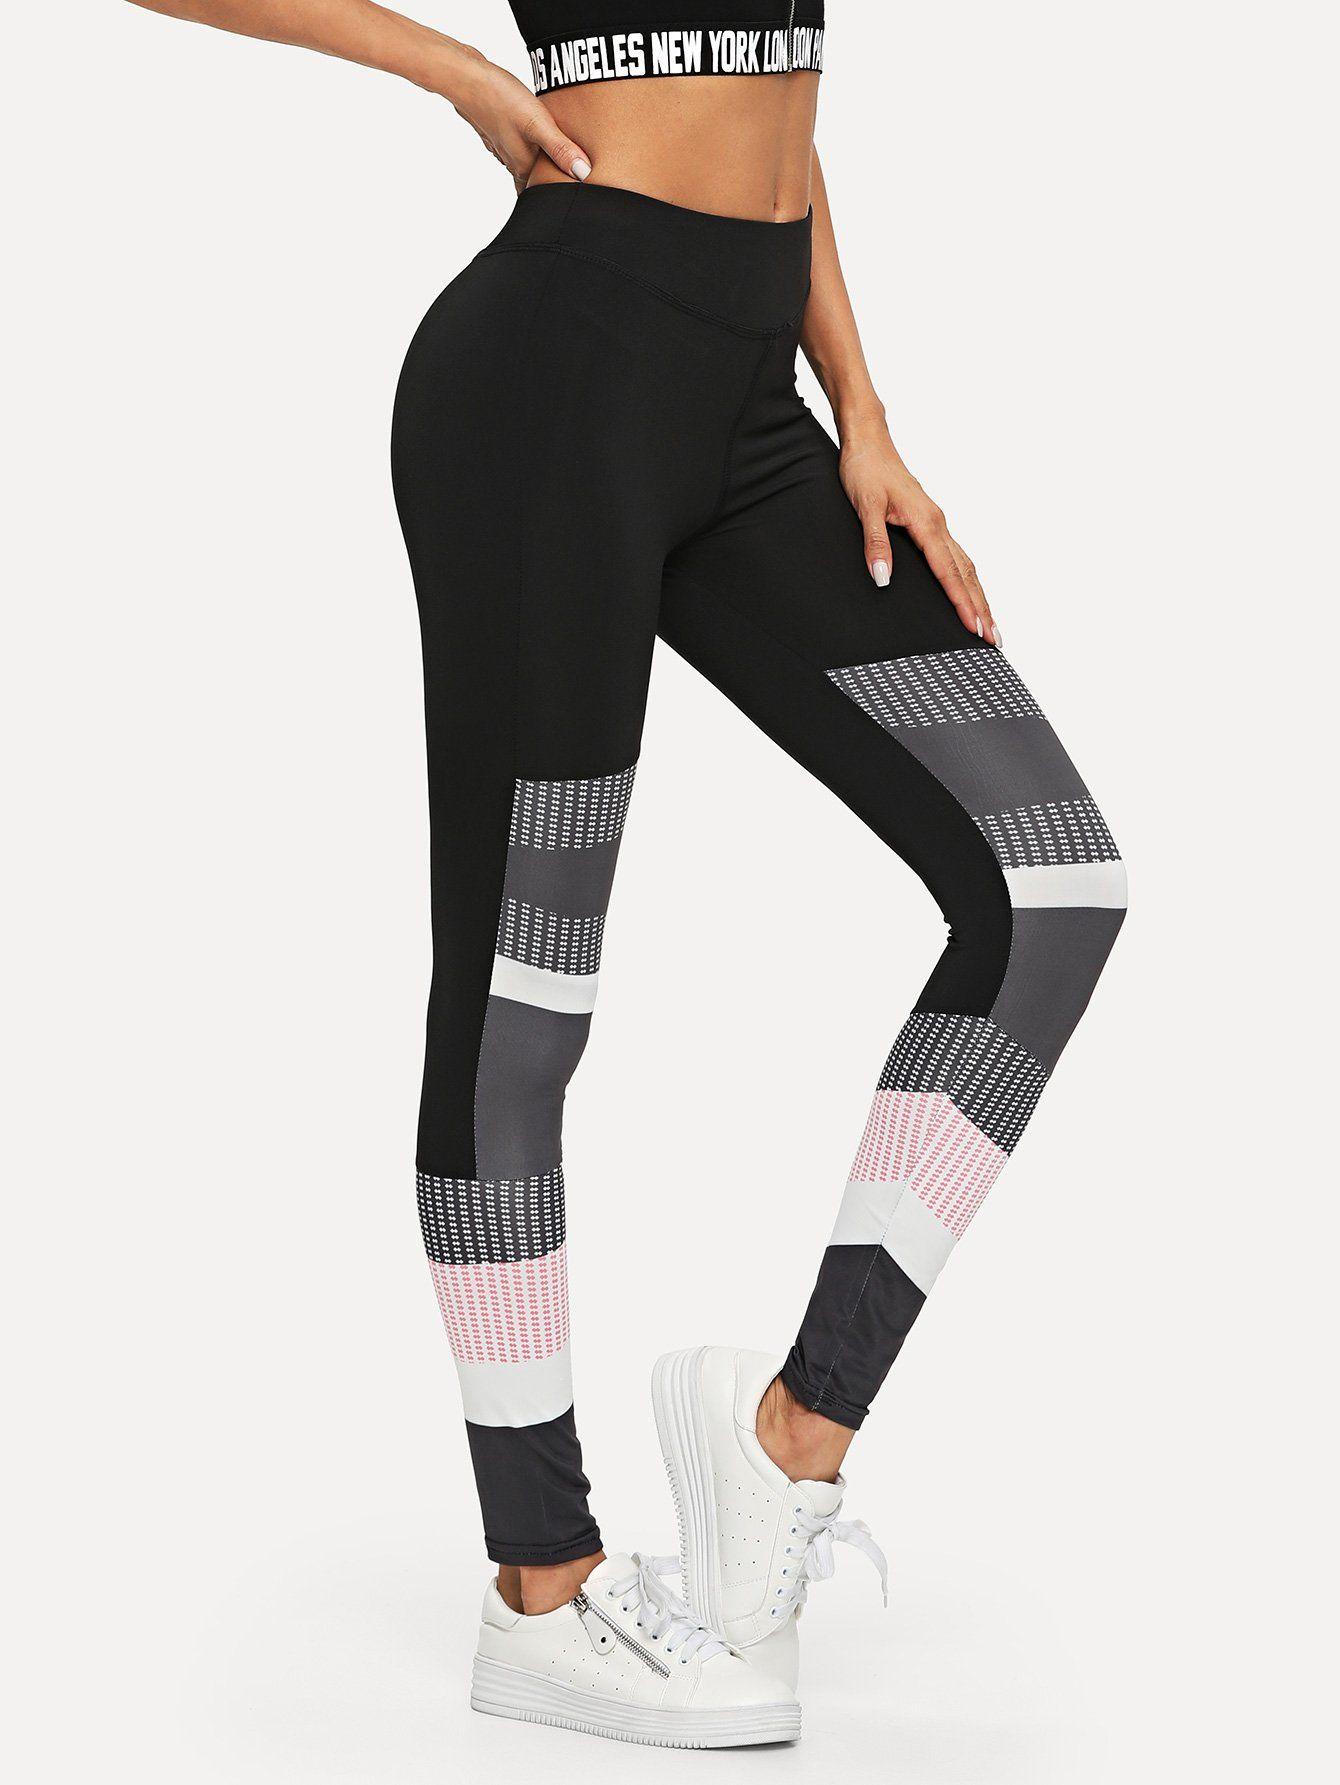 63b755d526cf8 Color Block Leggings | Fashion | Leggings, Leggings fashion ...